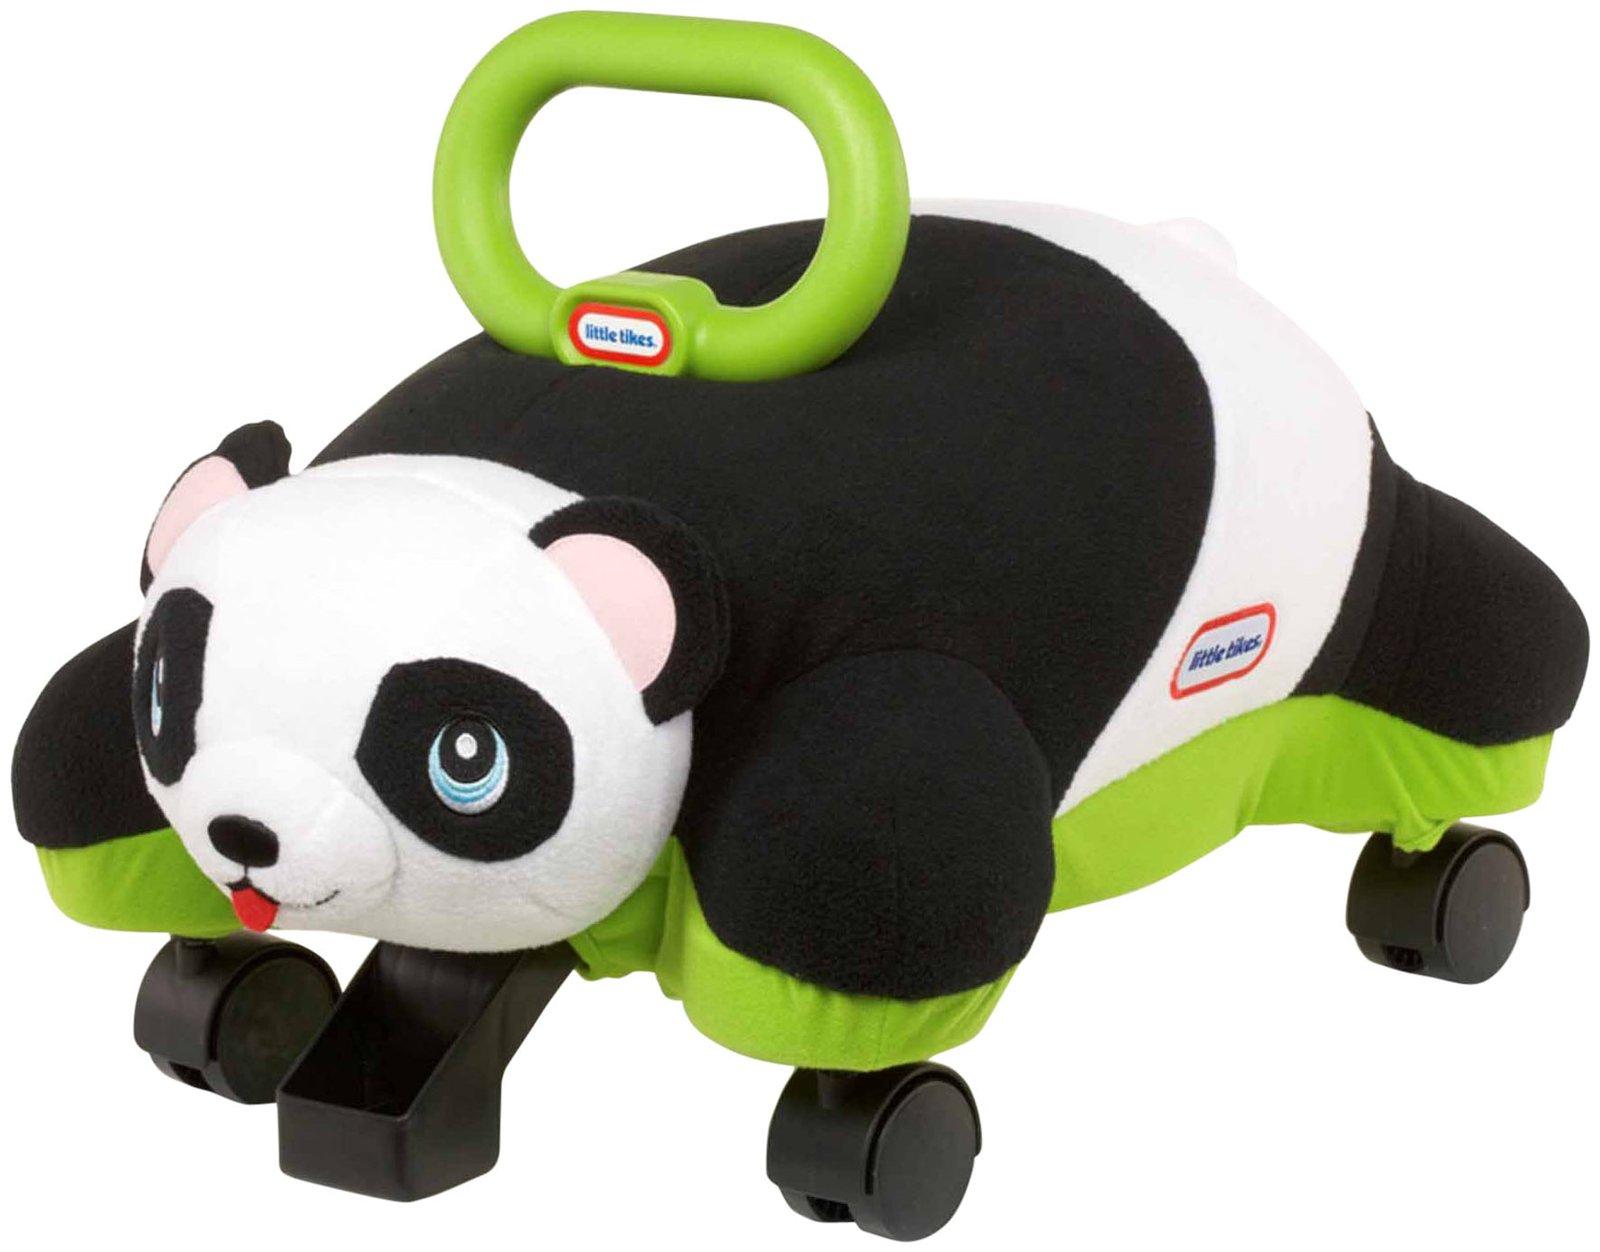 Little Tikes Pillow Racers | Sylpojessica Toys Rental - Sewa menyewa jadi lebih mudah di Spotsewa